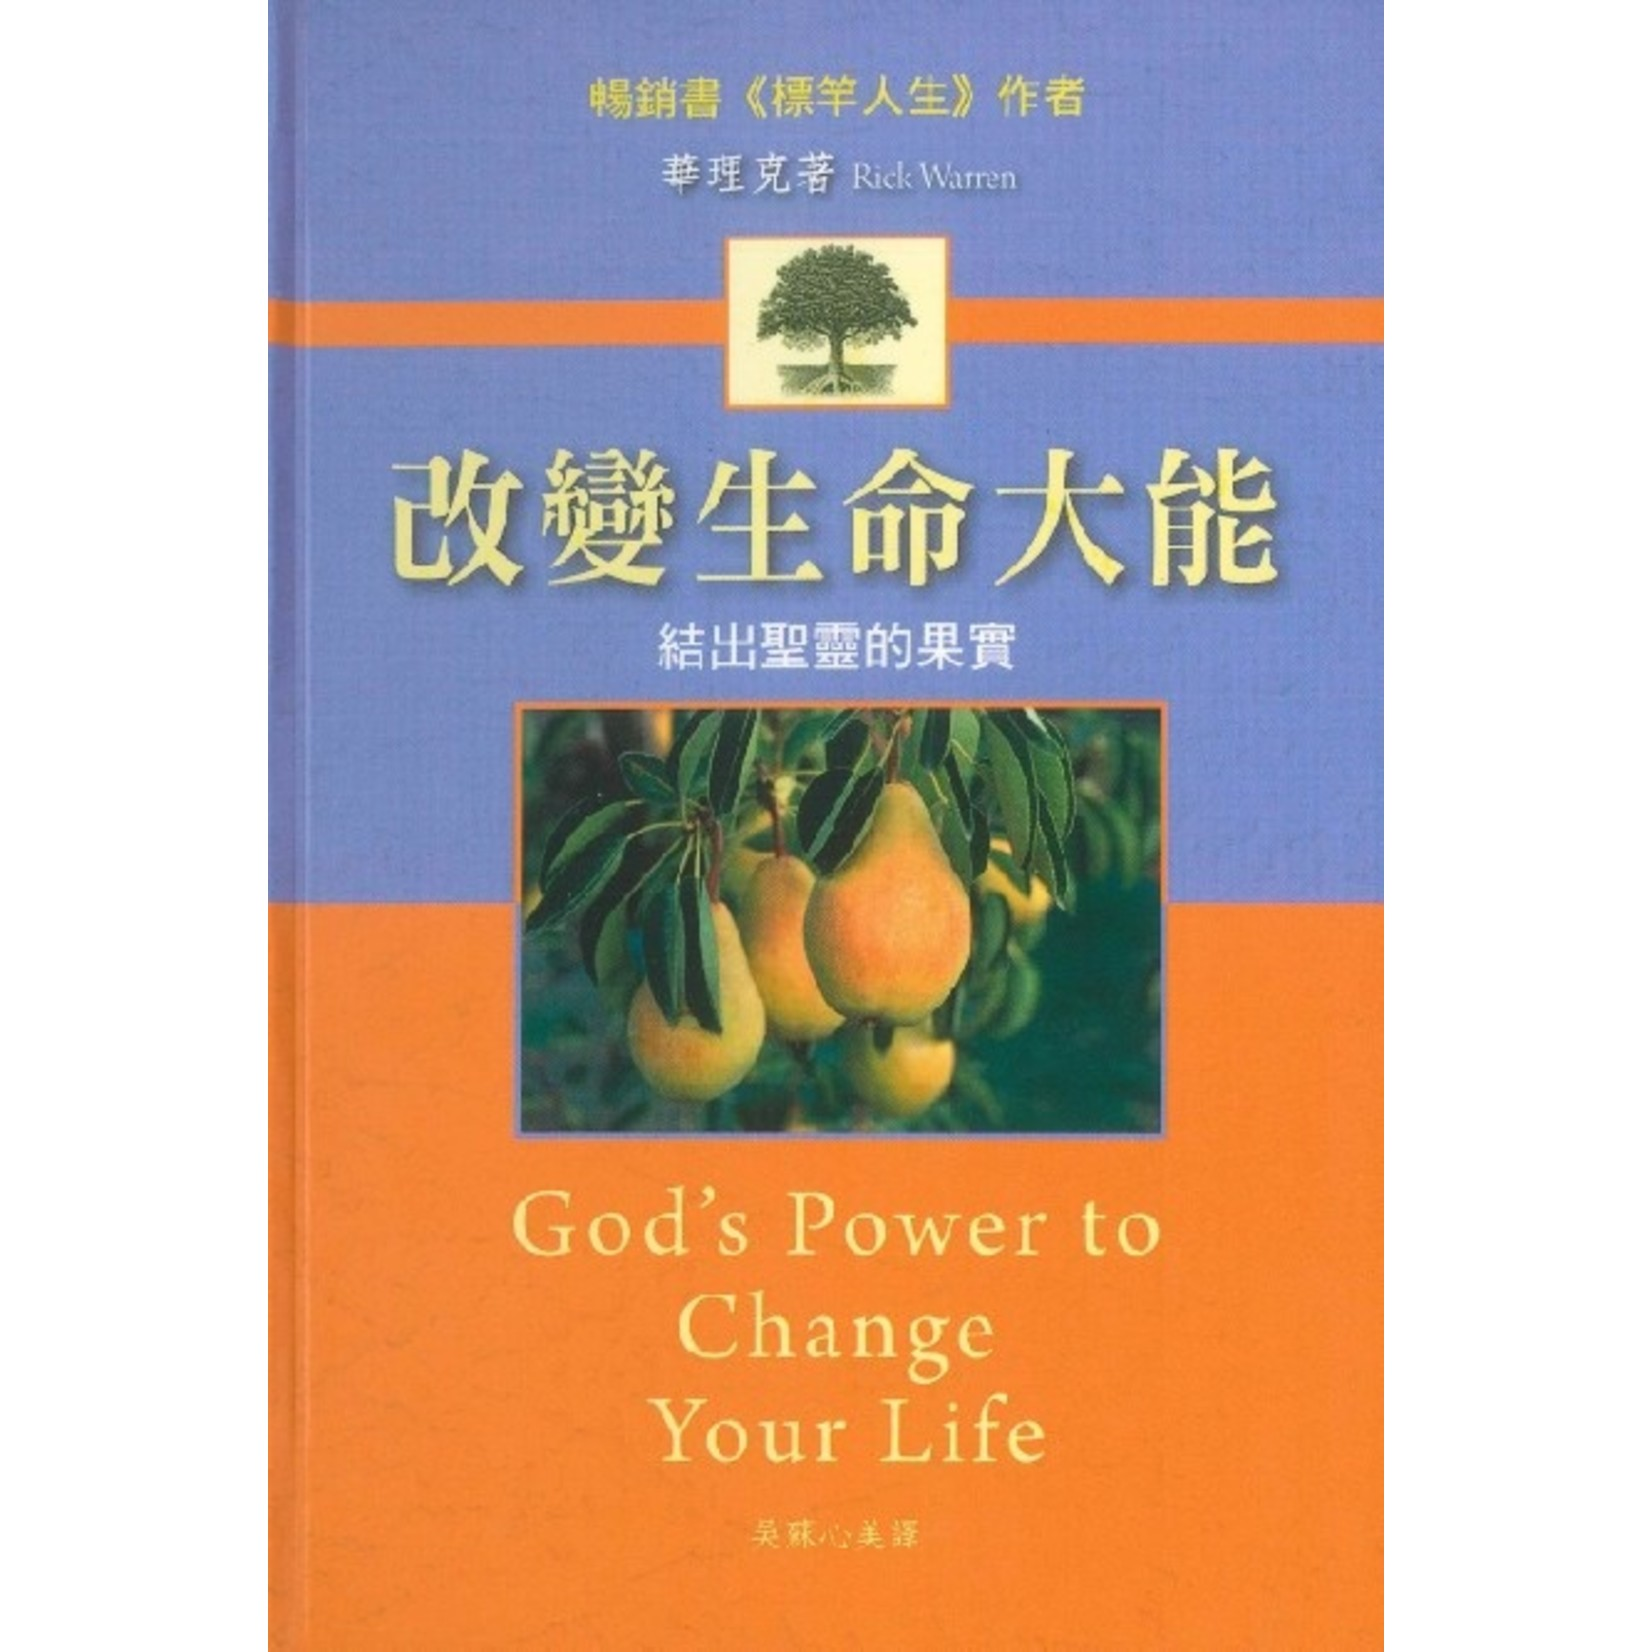 基督使者協會 Ambassadors for Christ 改變生命大能:結出聖靈的果實 God's Power To Change Your Life